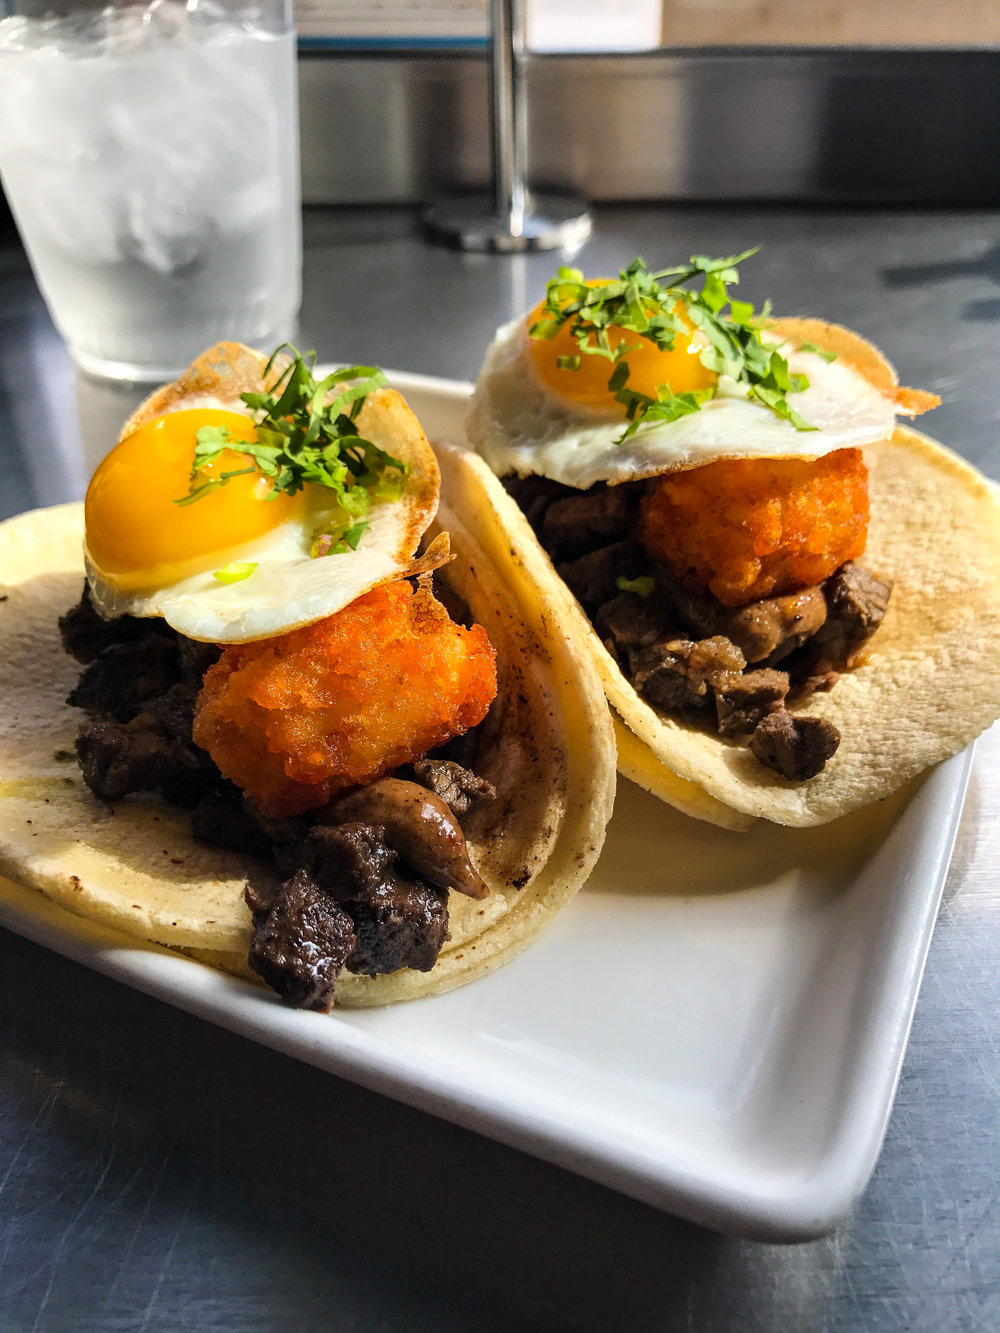 Loco Modo Tacos from Komodo - Hawaiian seared Angus ground beef patty, green onions, pineapple teriyaki sauce, white rice & sunny-side up egg.$3.45 each